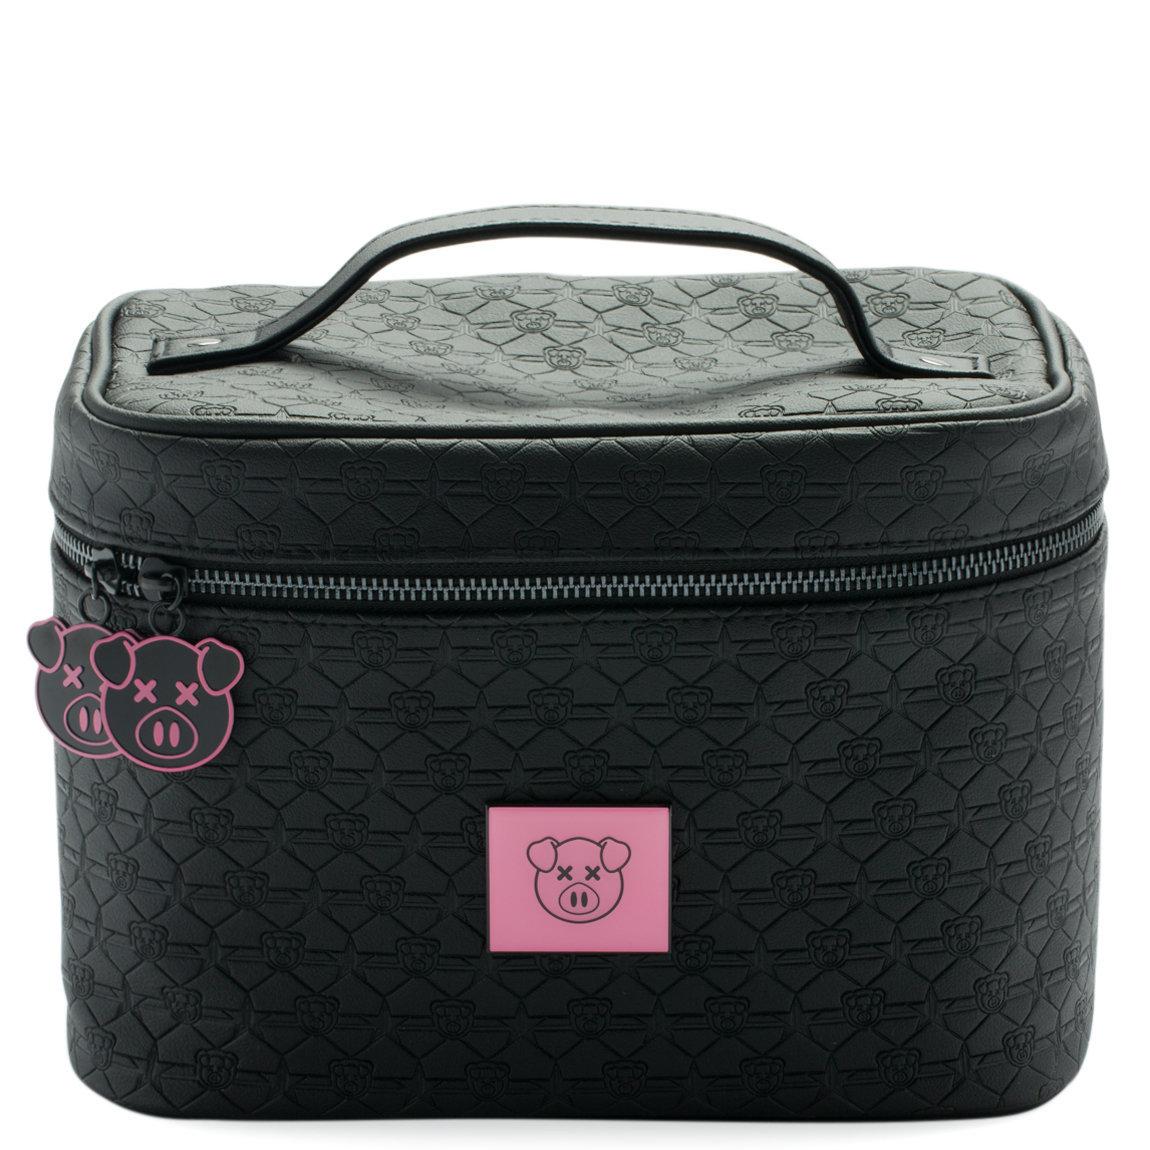 Jeffree Star Cosmetics Shane Dawson Imprint Travel Bag product swatch.